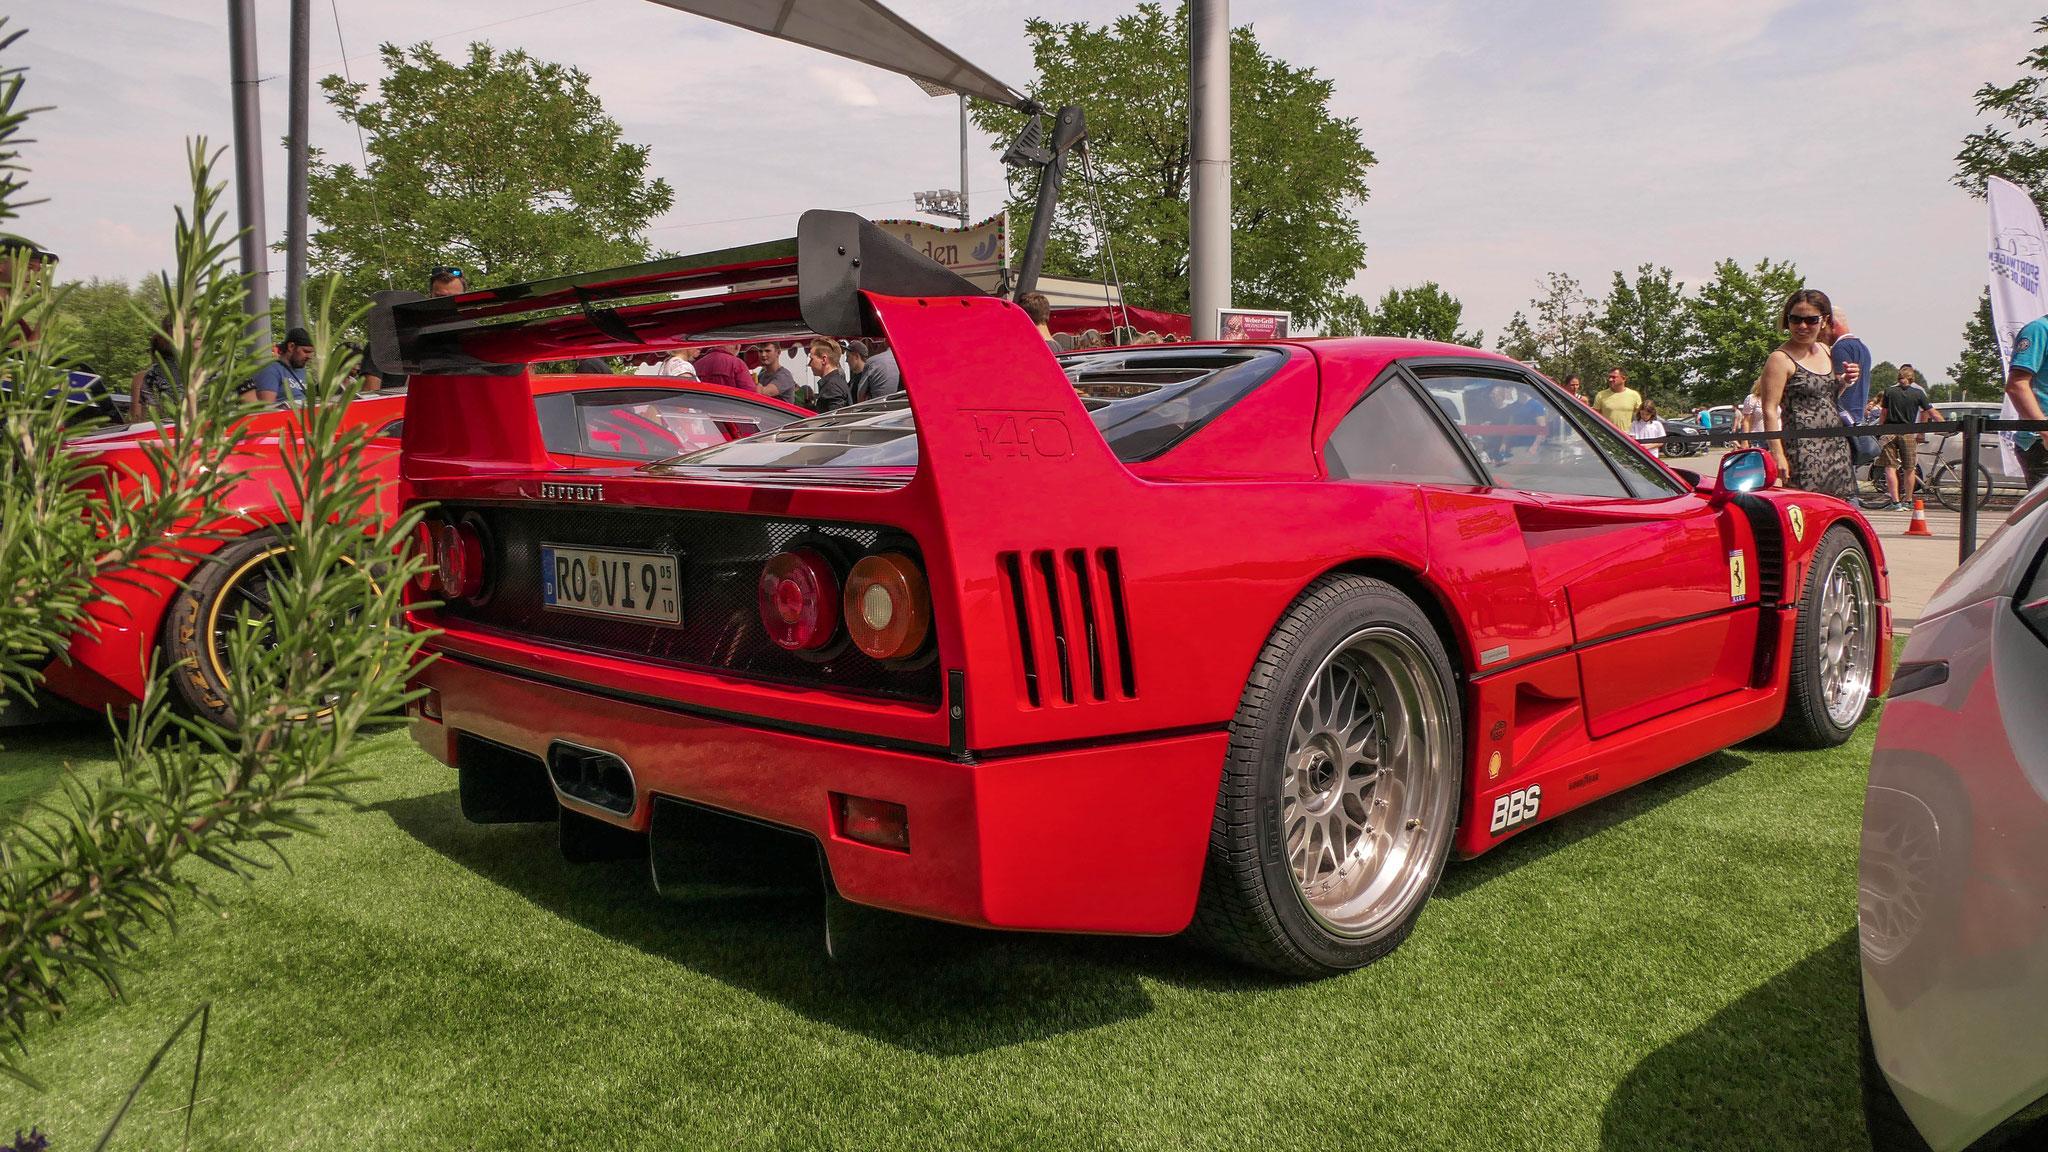 Ferrari F40 - RO-VI-9